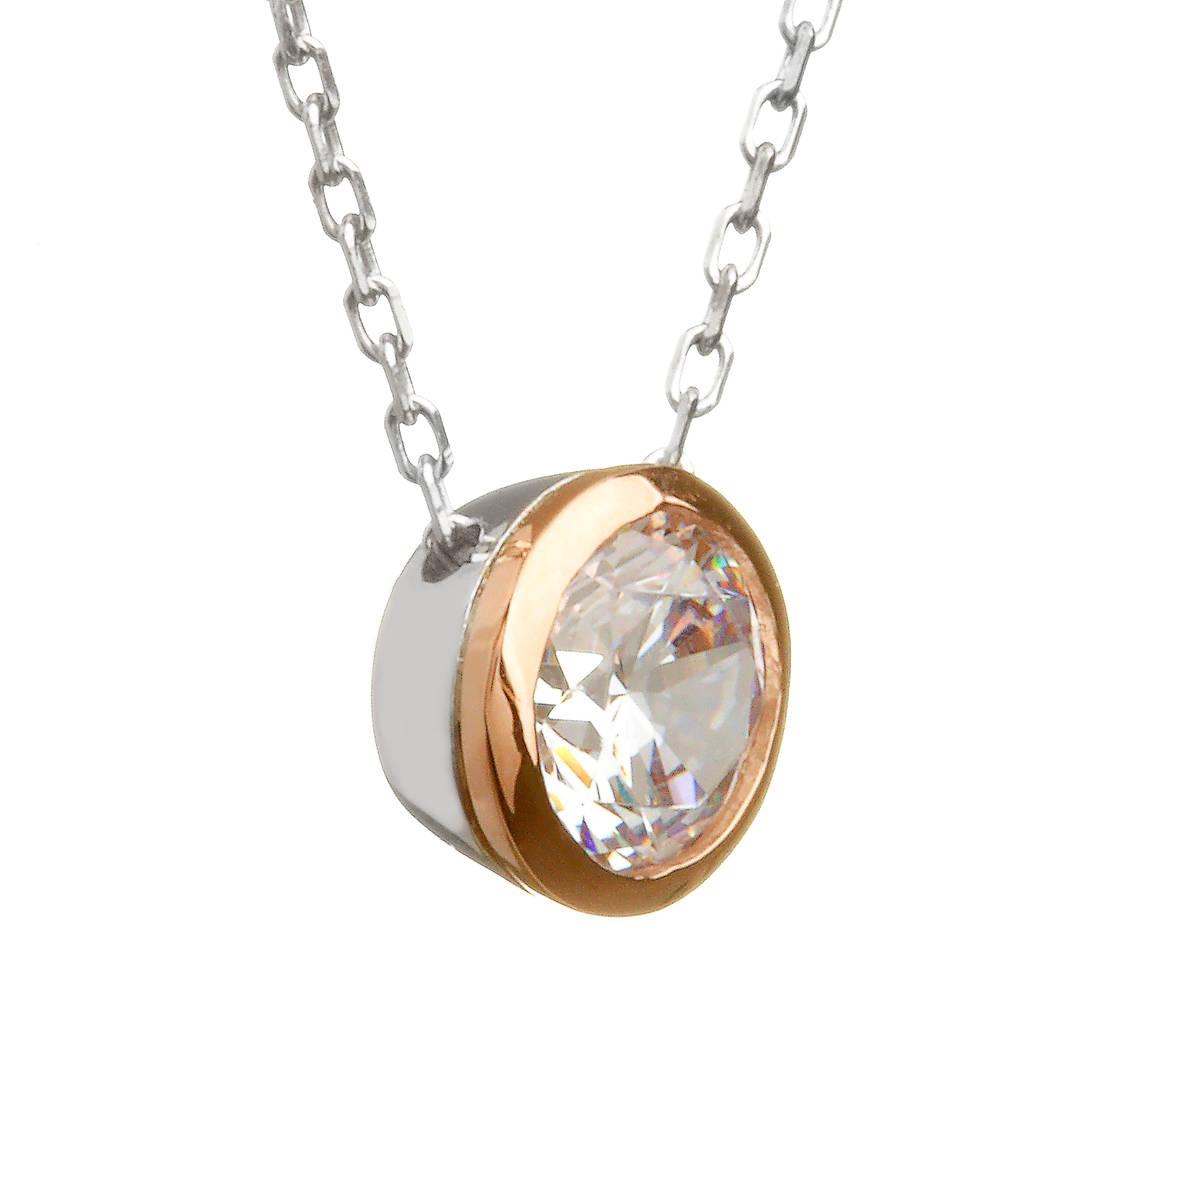 House of Lor silver/rose cz pendant made from rare Irish goldnick/dwpck